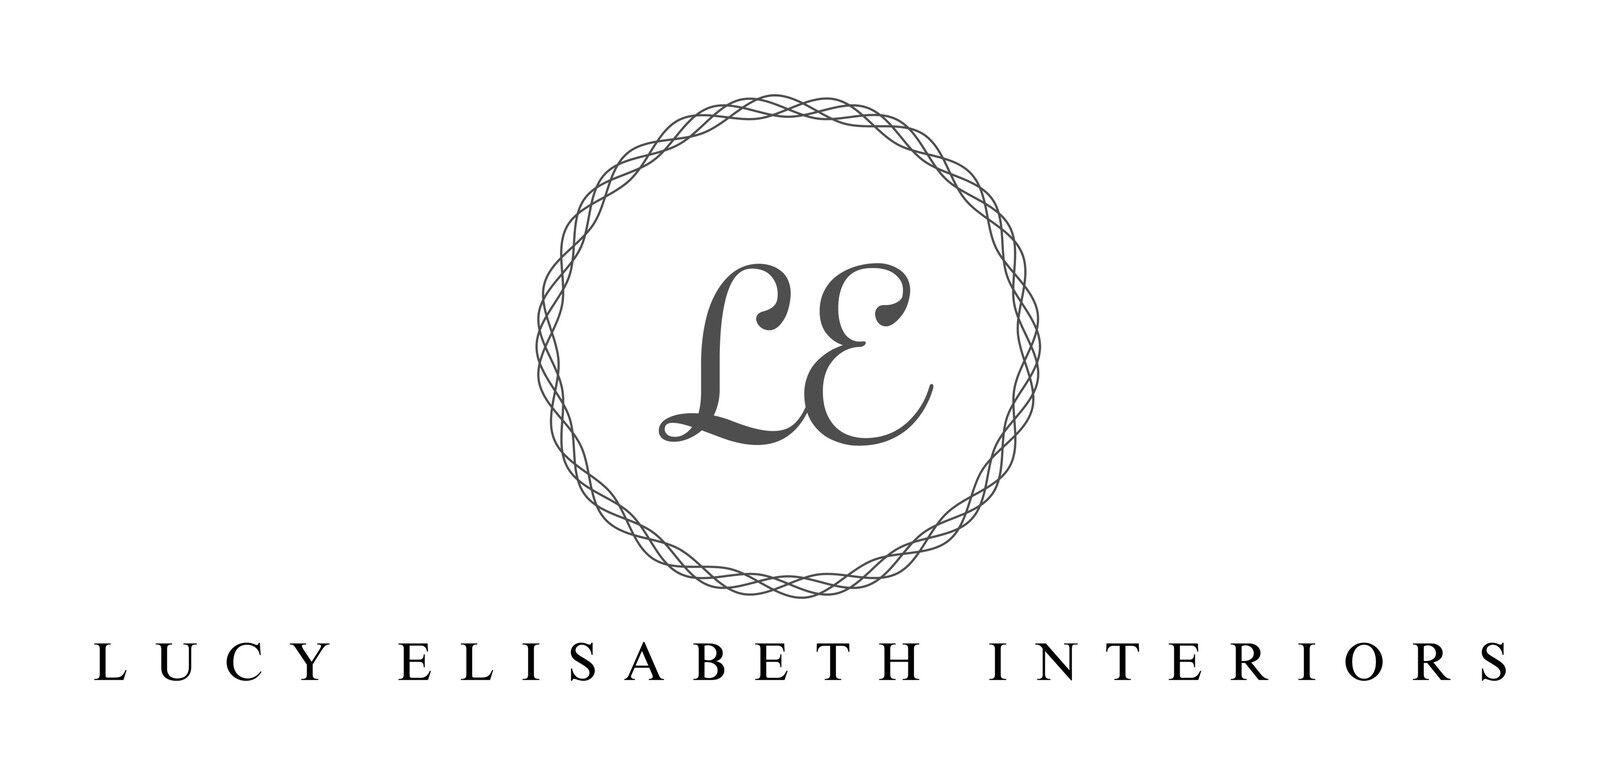 Lucy Elisabeth Interiors